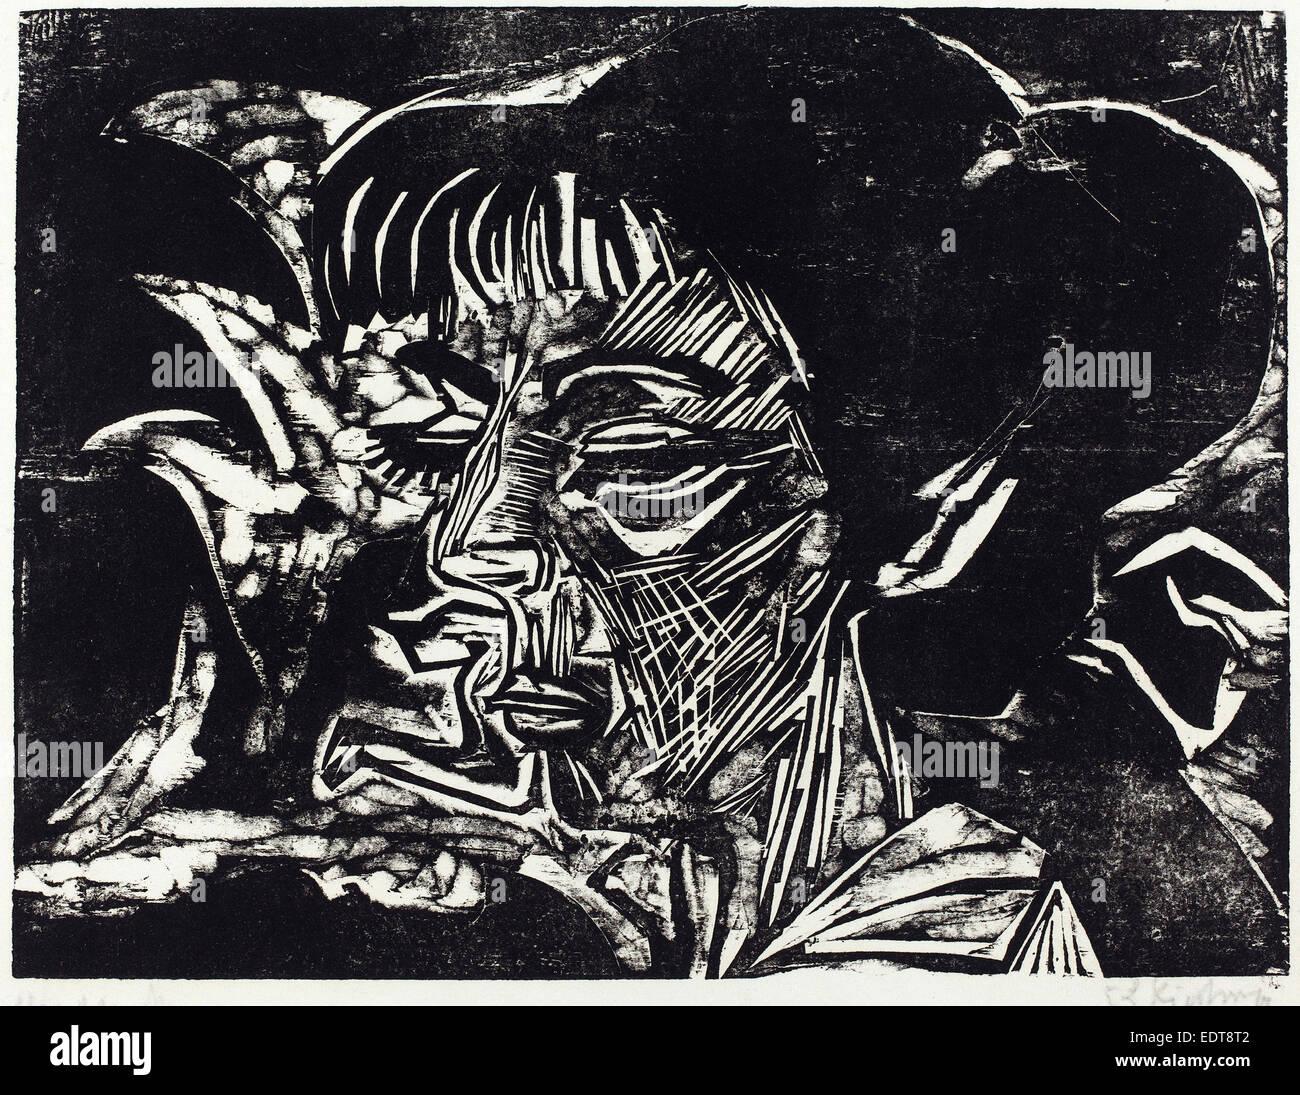 Ernst Ludwig Kirchner, Fanny Wocke, German, 1880 - 1938, 1916, woodcut in black on blotting paper - Stock Image